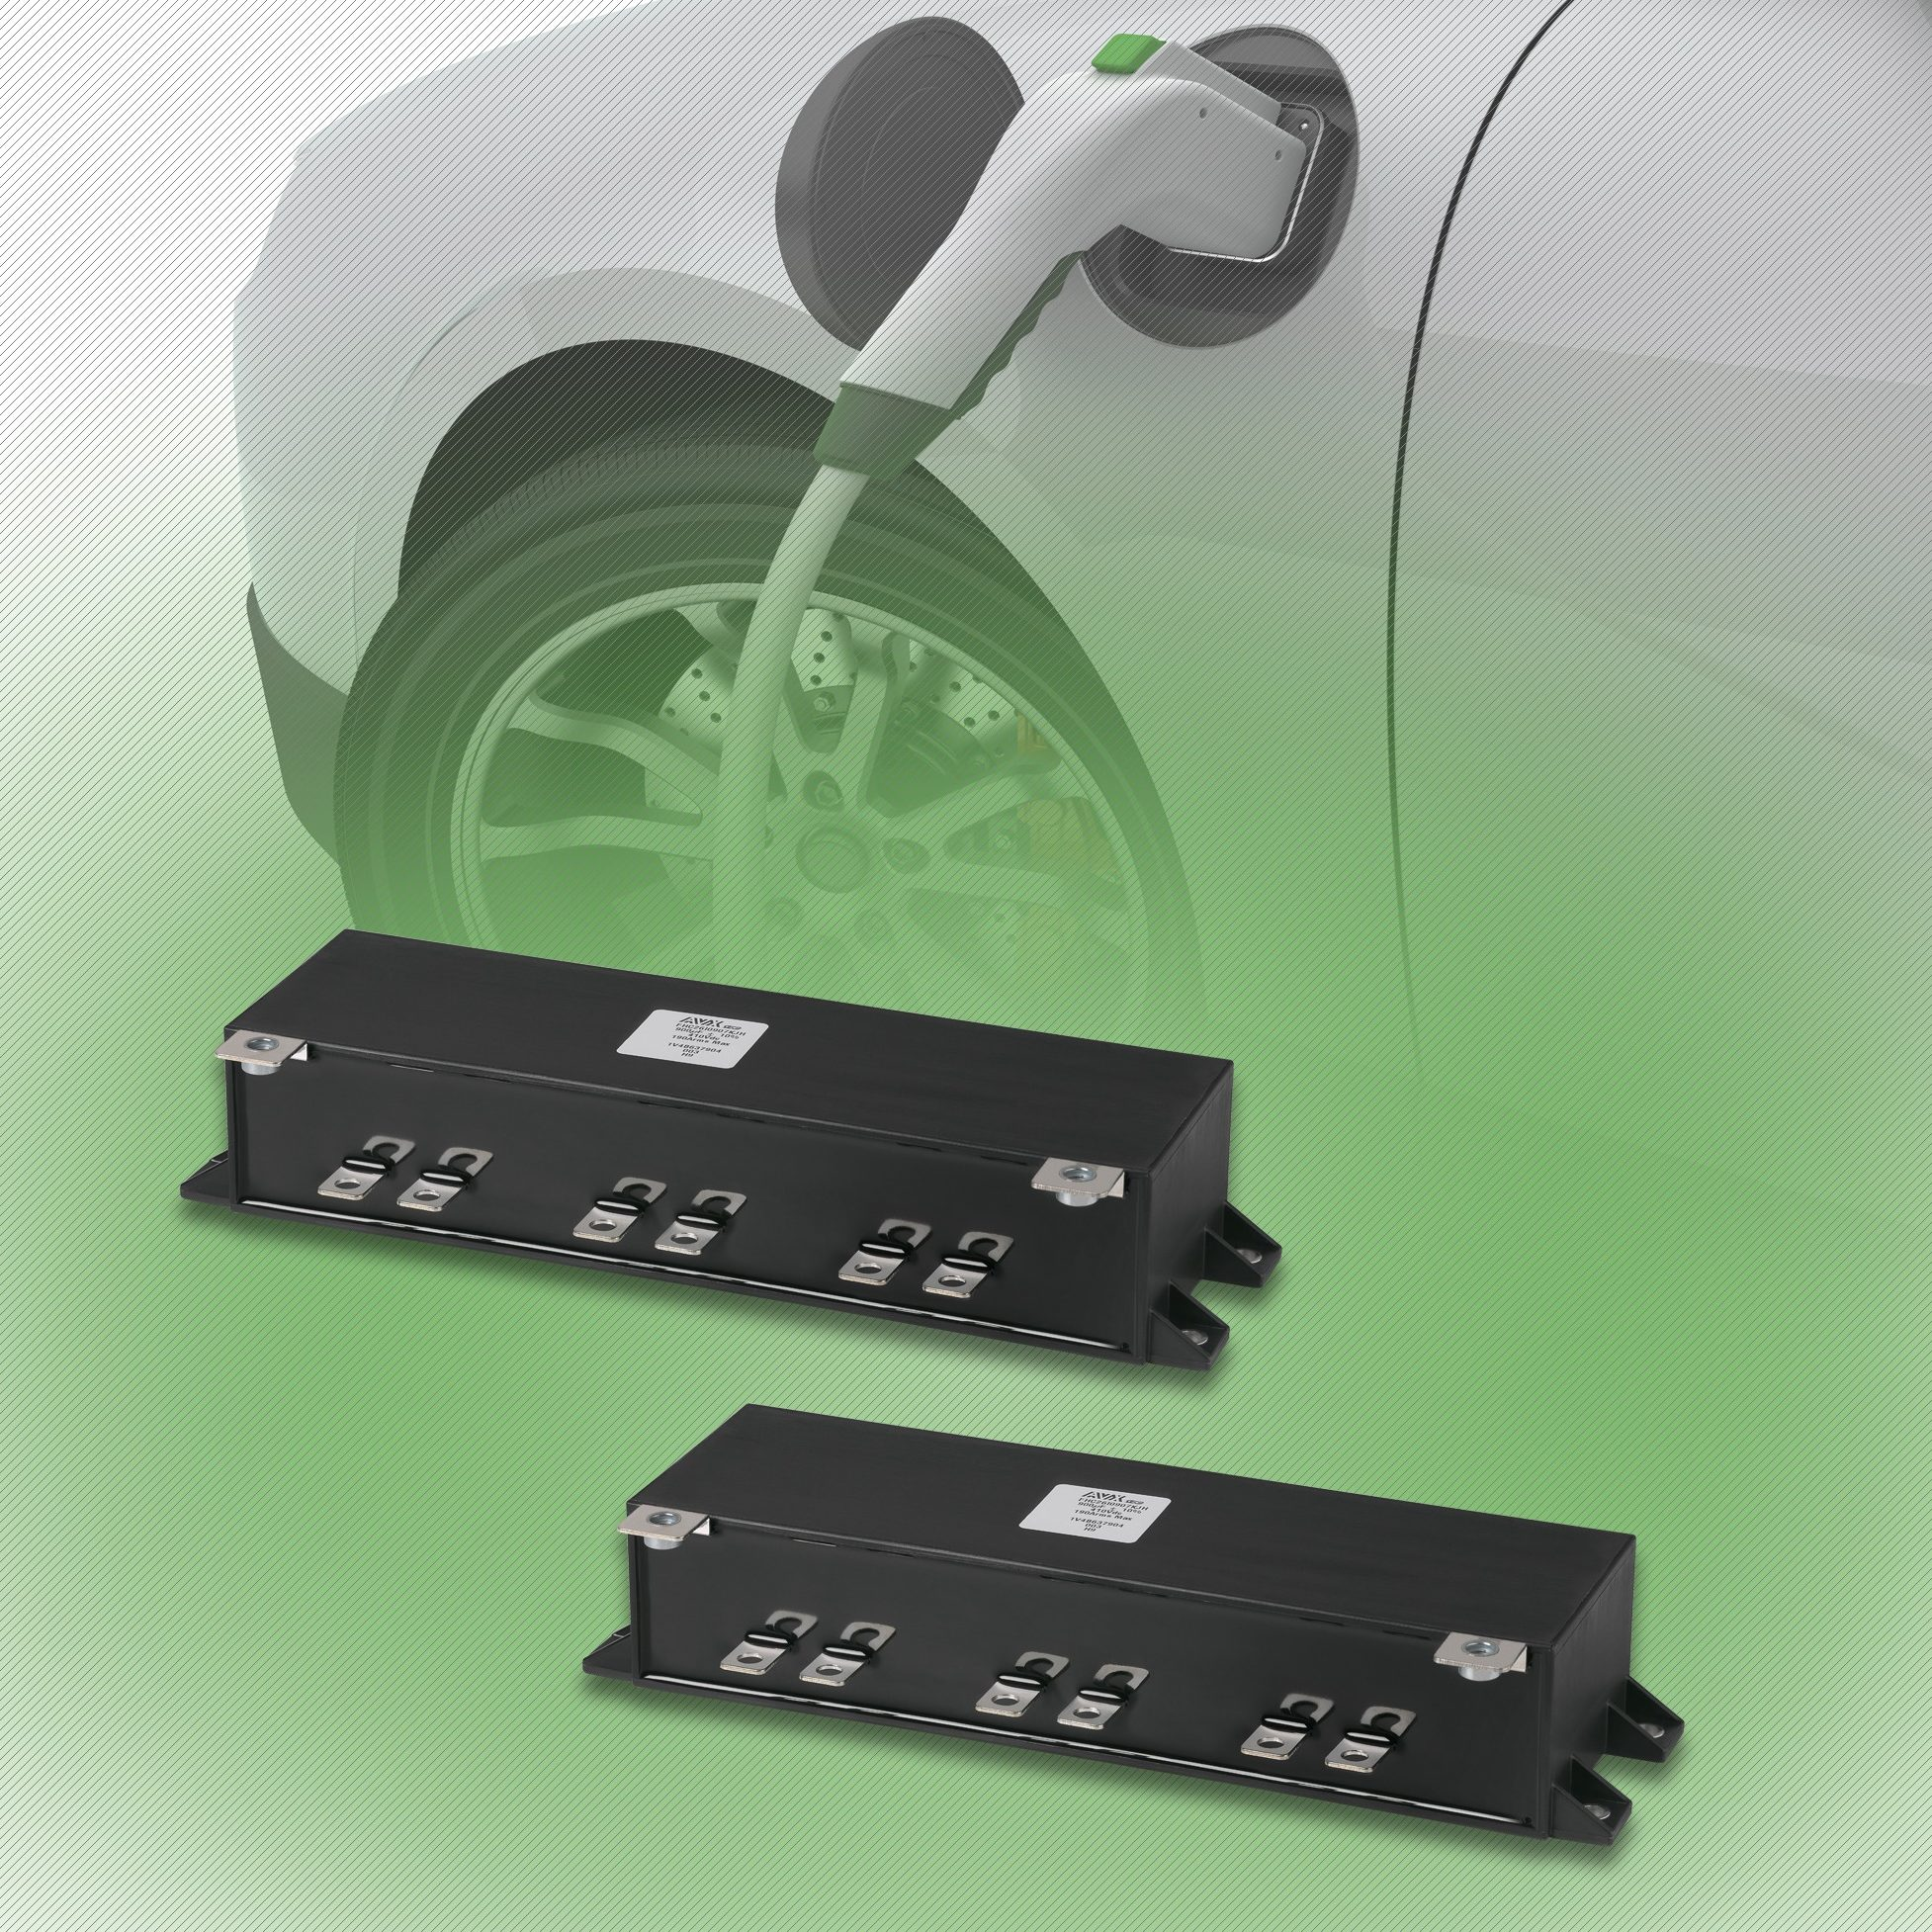 AVX Releases New FHC1 & FHC2 Series Power Film Capacitors for EV/HEV Applications